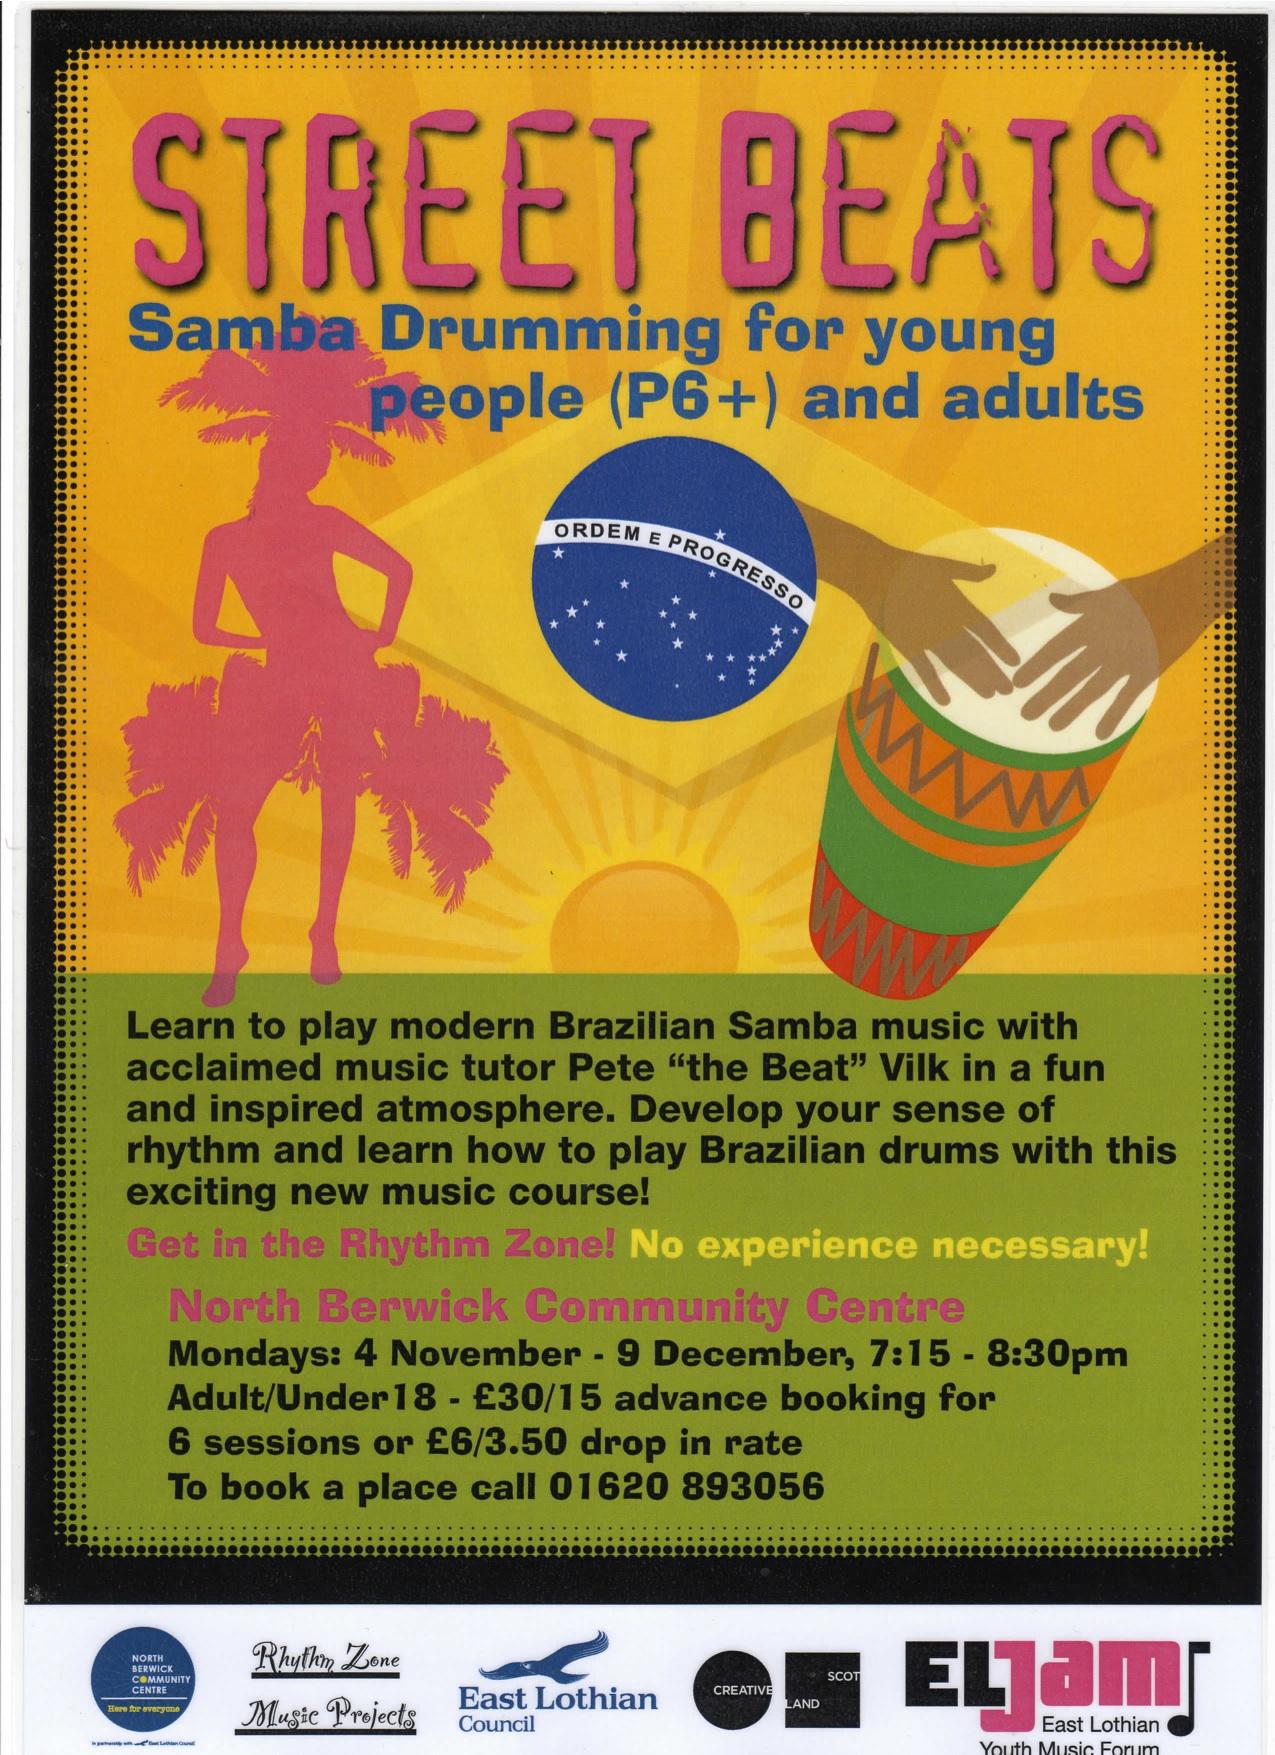 New Winter Samba Course 2013!